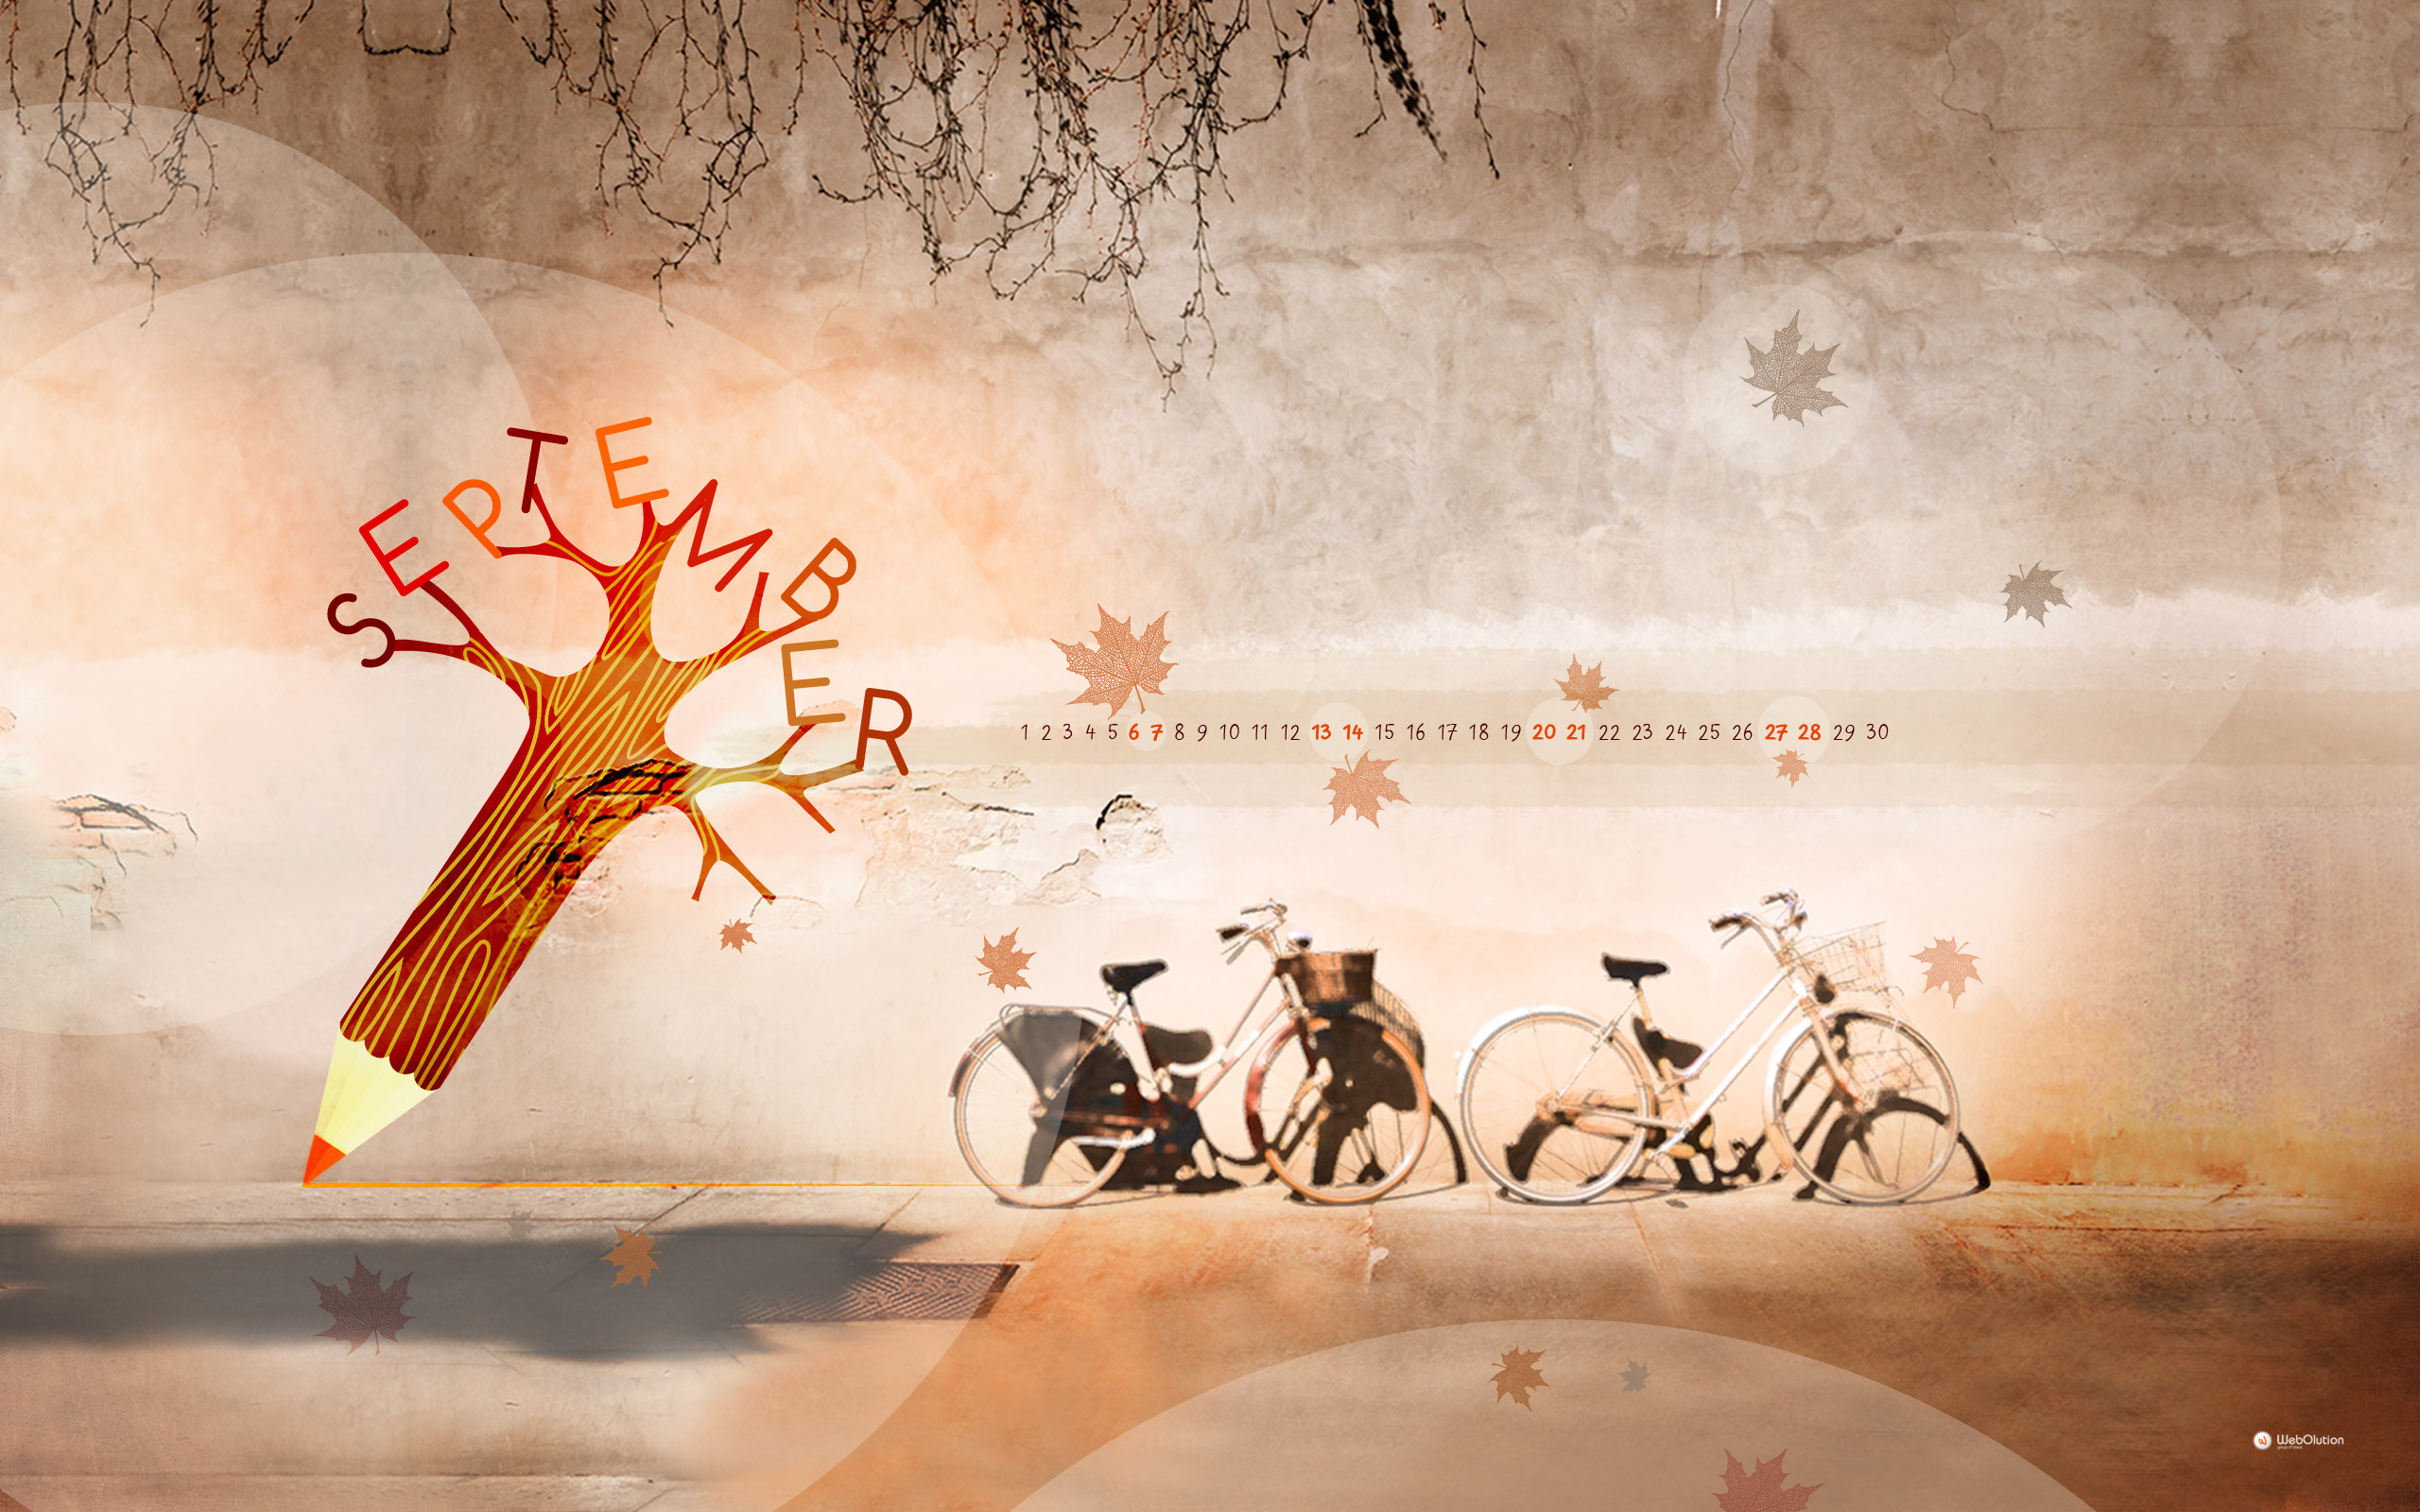 Web Design   Wall Paper September 453947   HD Wallpaper Download 2560x1600